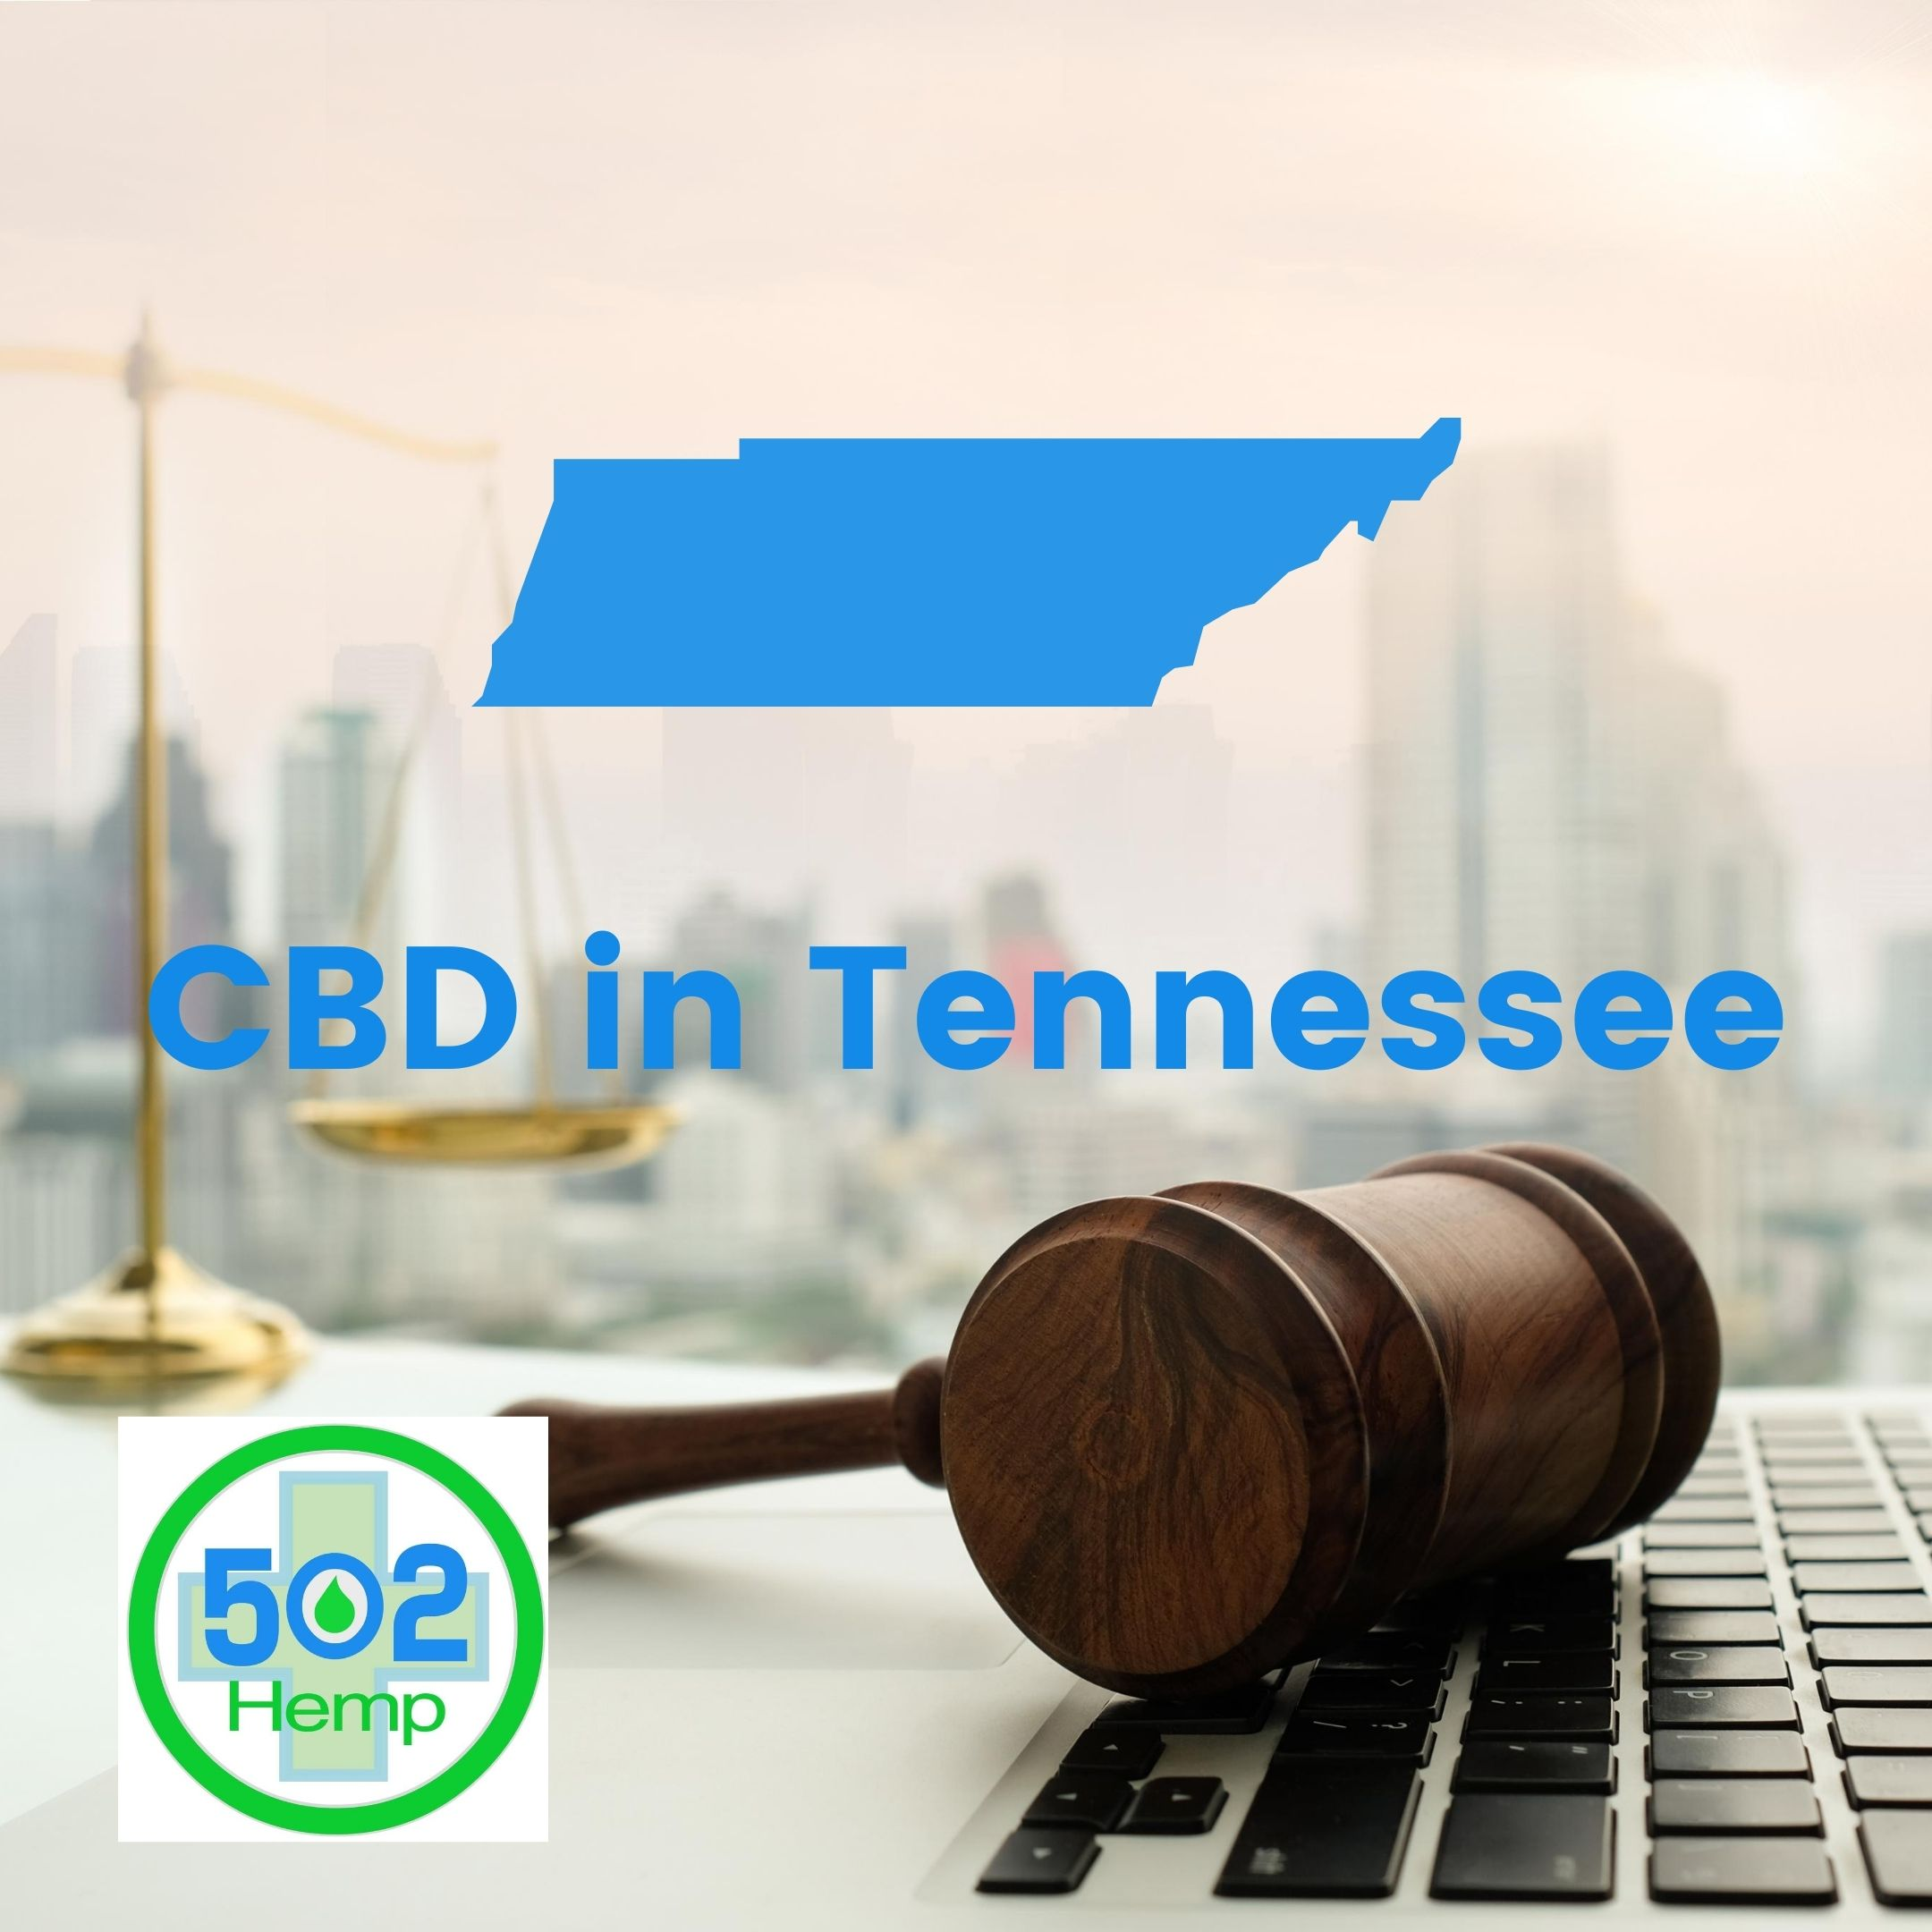 CBD in Tennessee